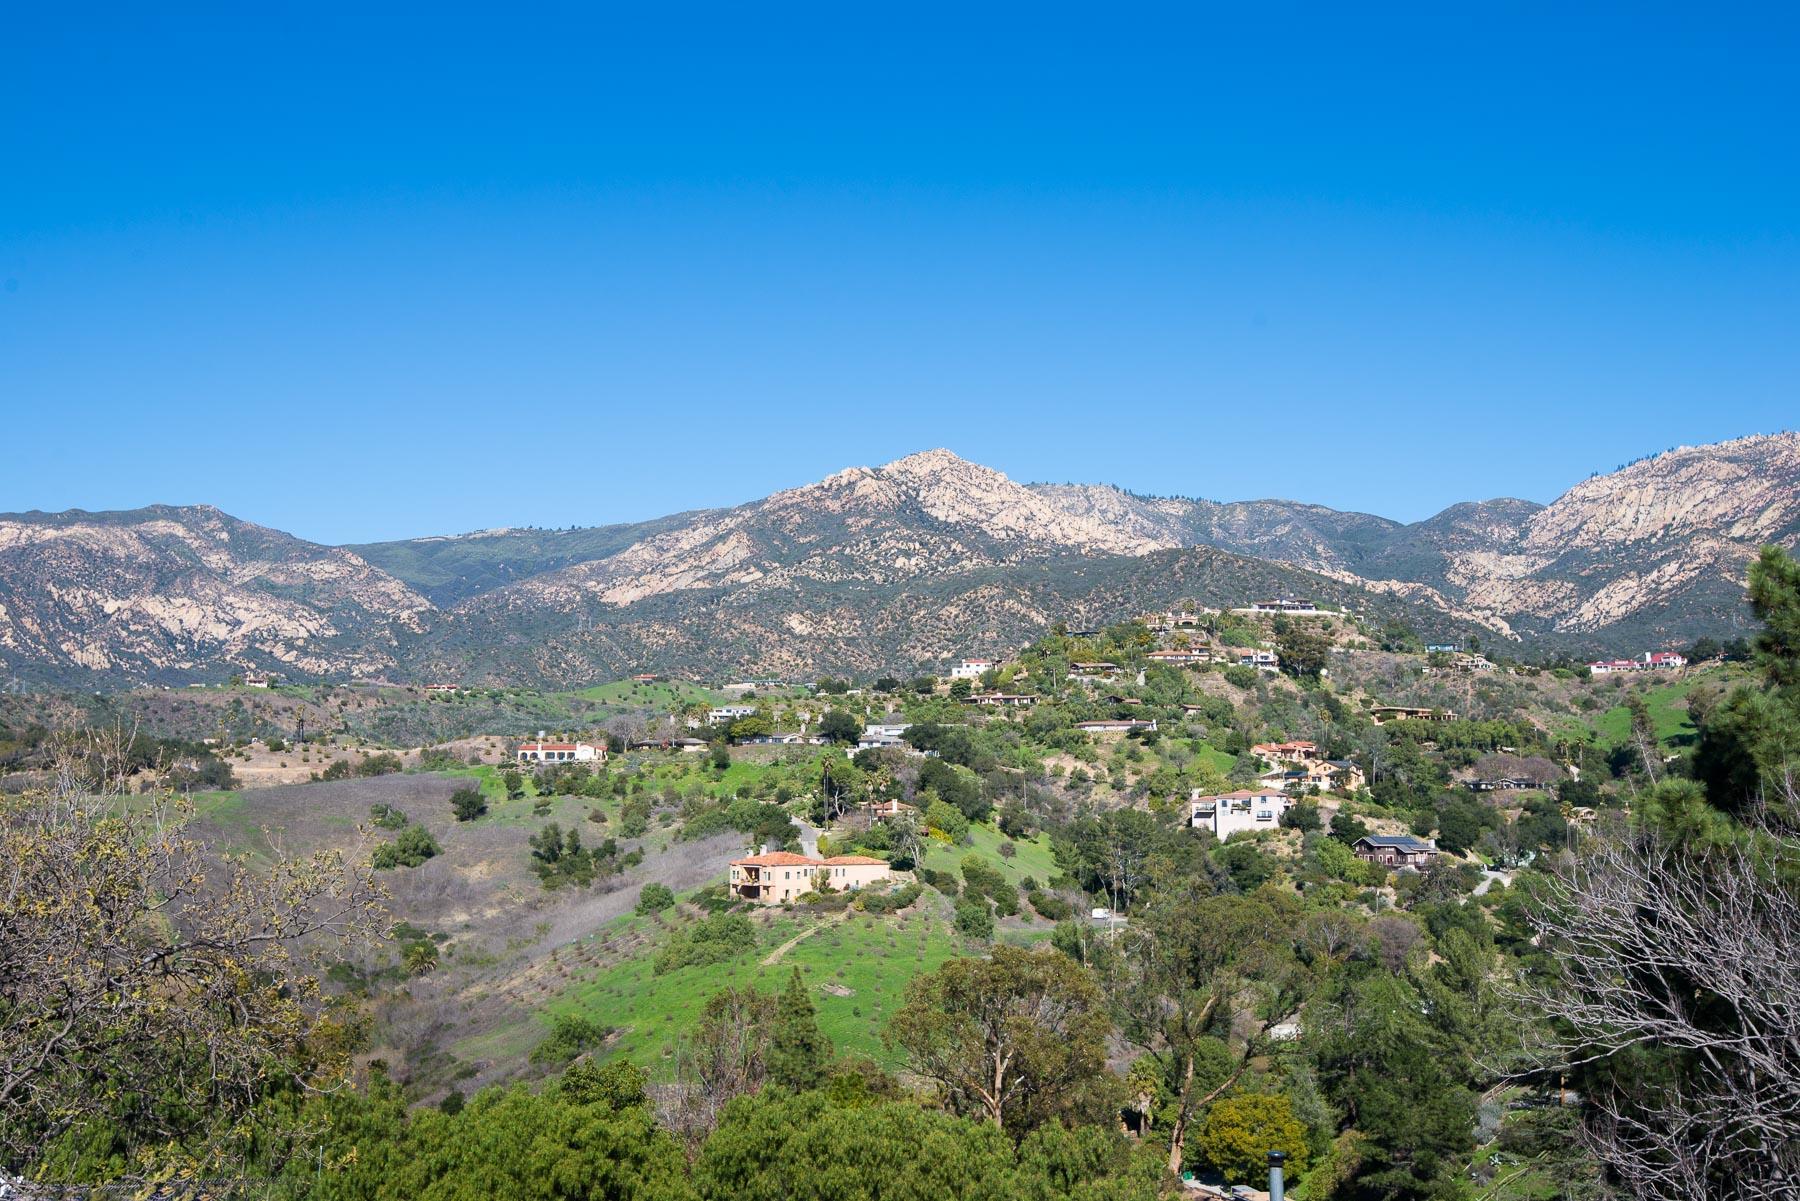 Property photo for 2846 Ben Lomond Dr Santa Barbara, California 93105 - 17-259